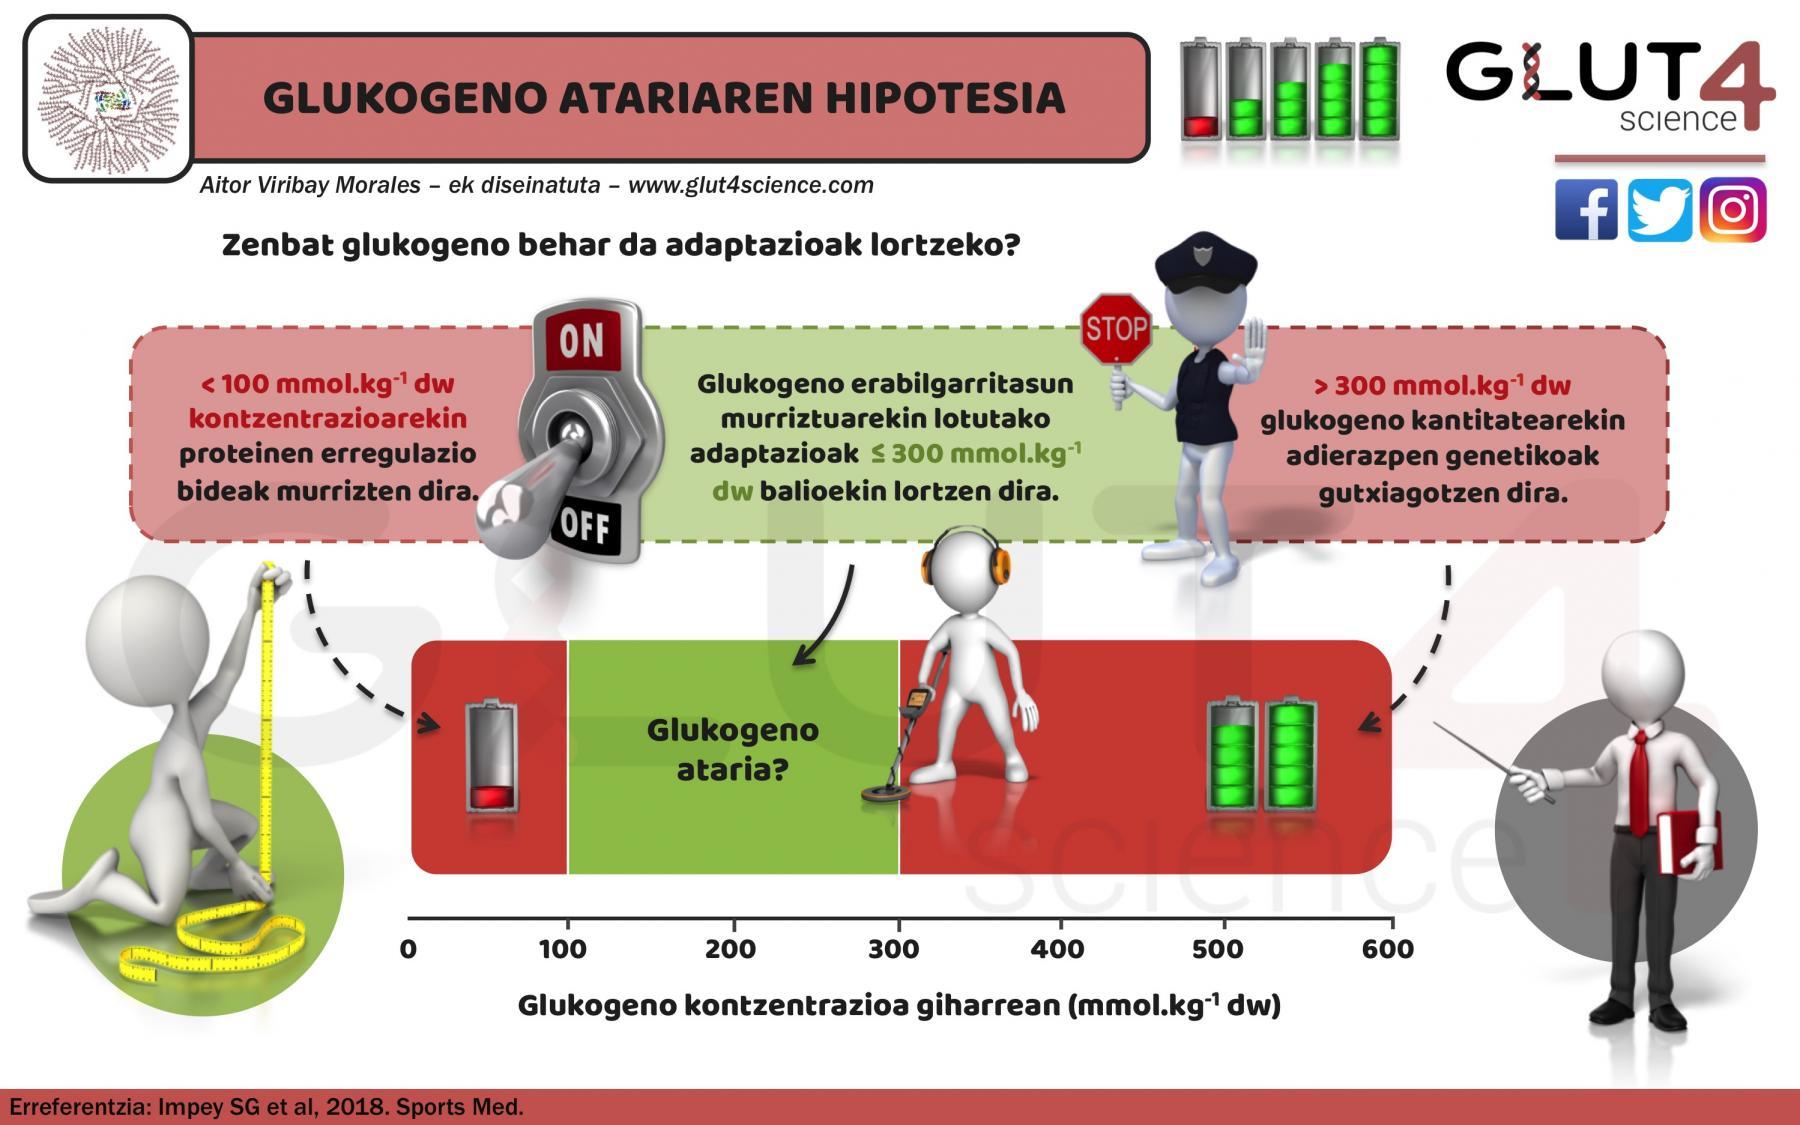 Glukogeno atariaren hipotesia